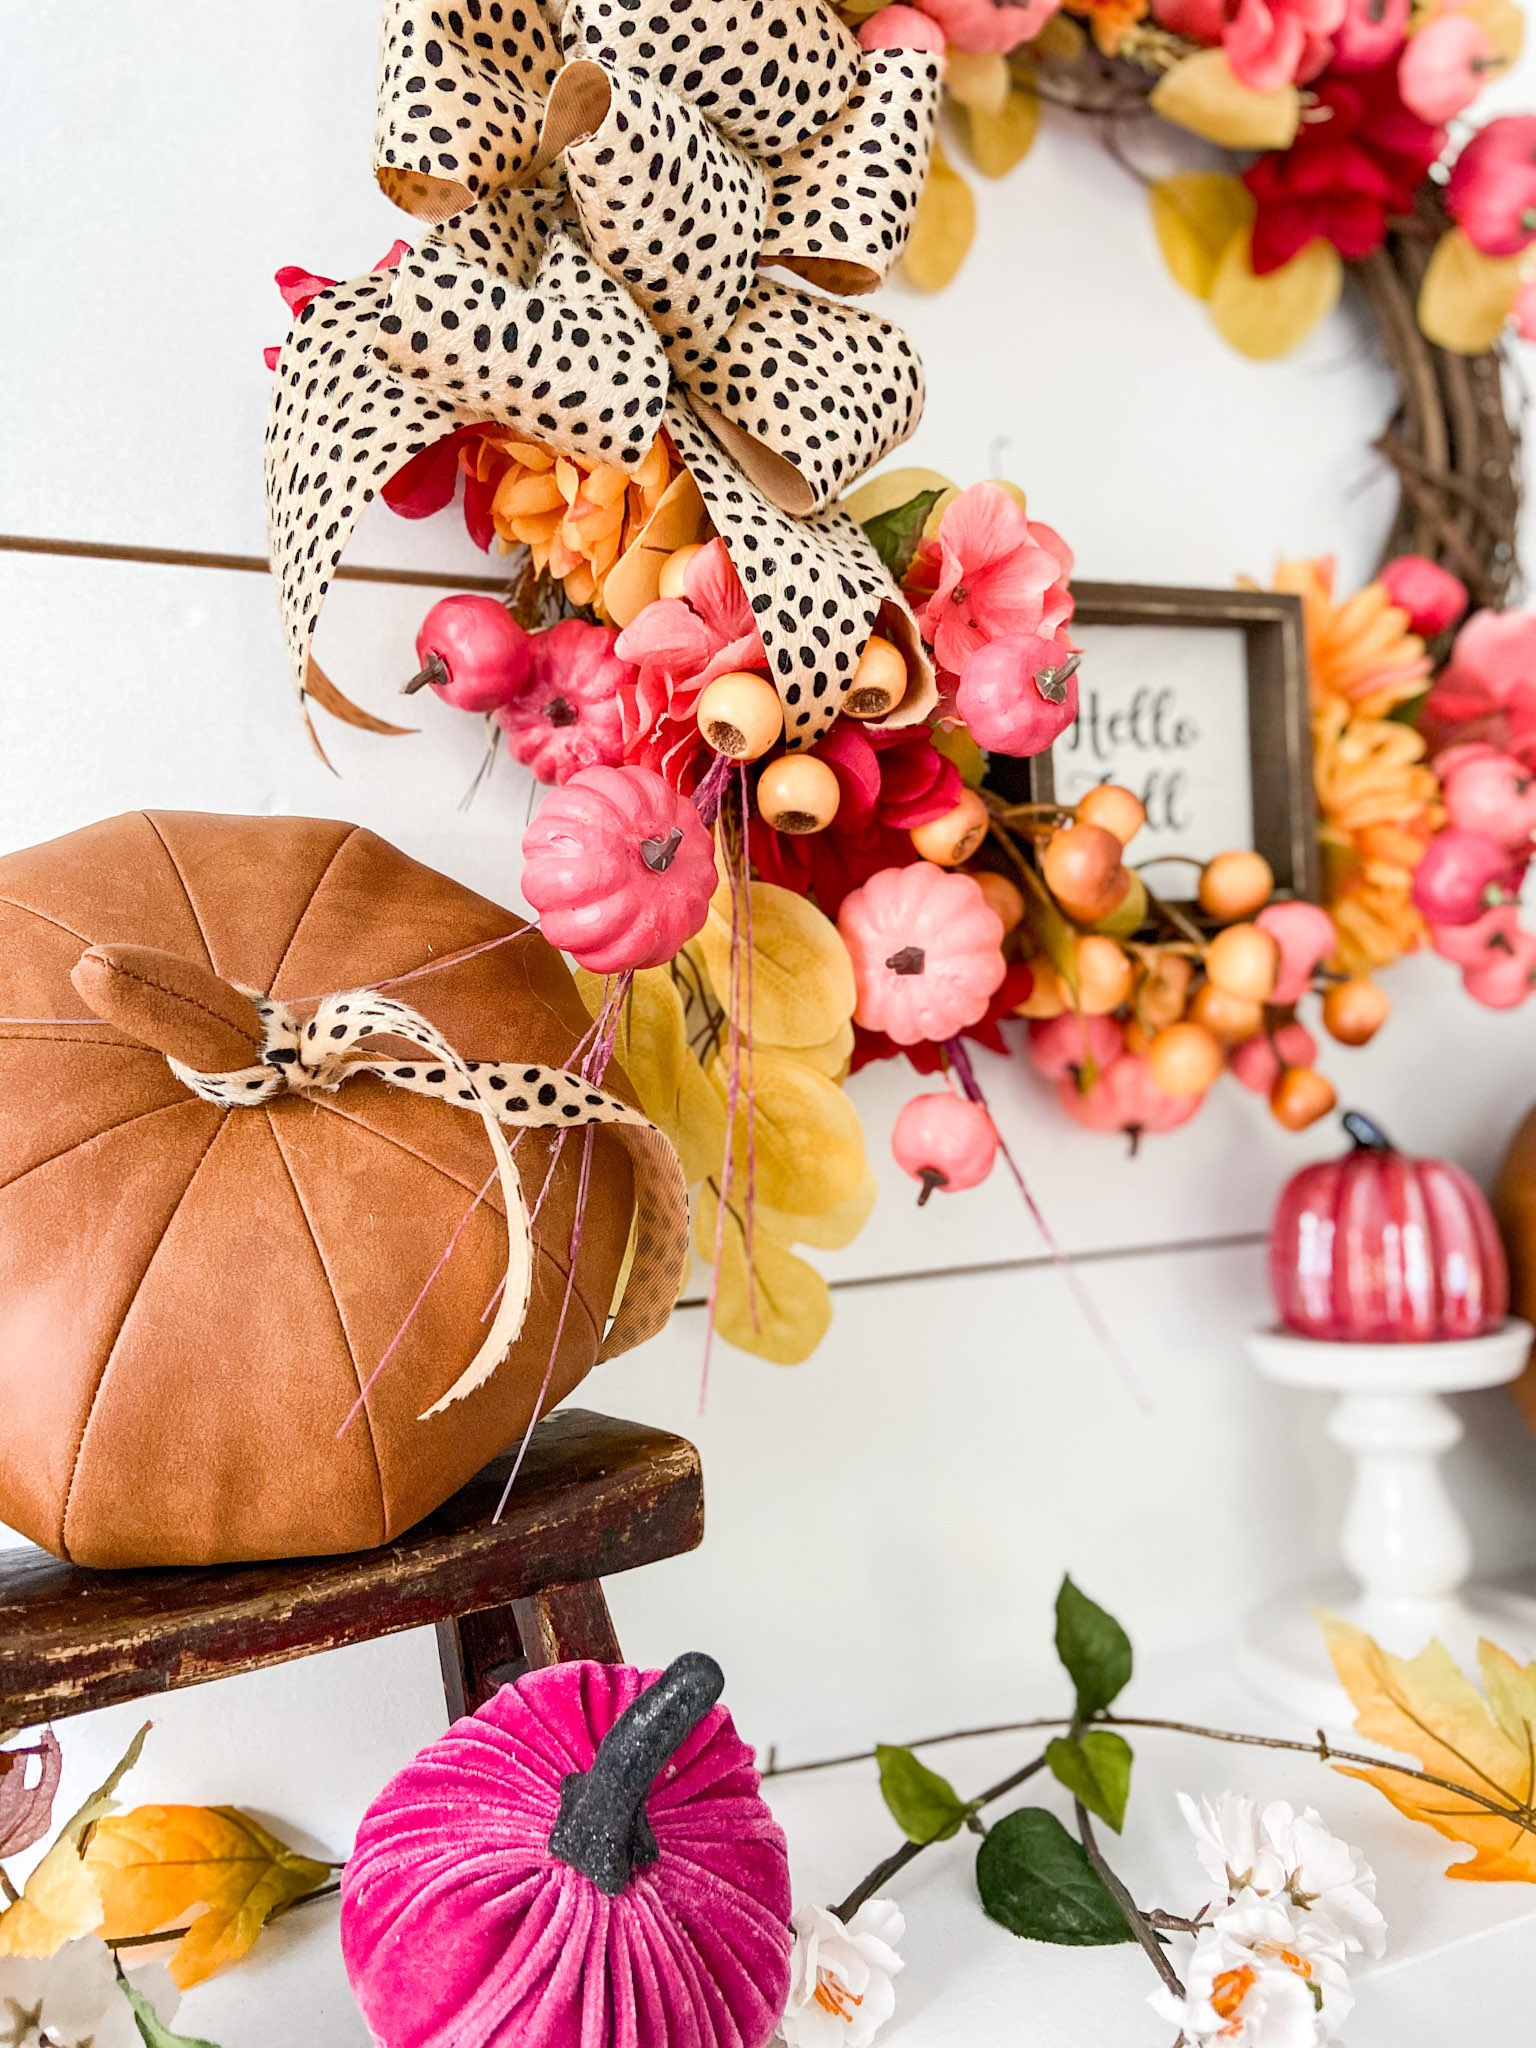 painted pumpkin wreath with cheetah bow